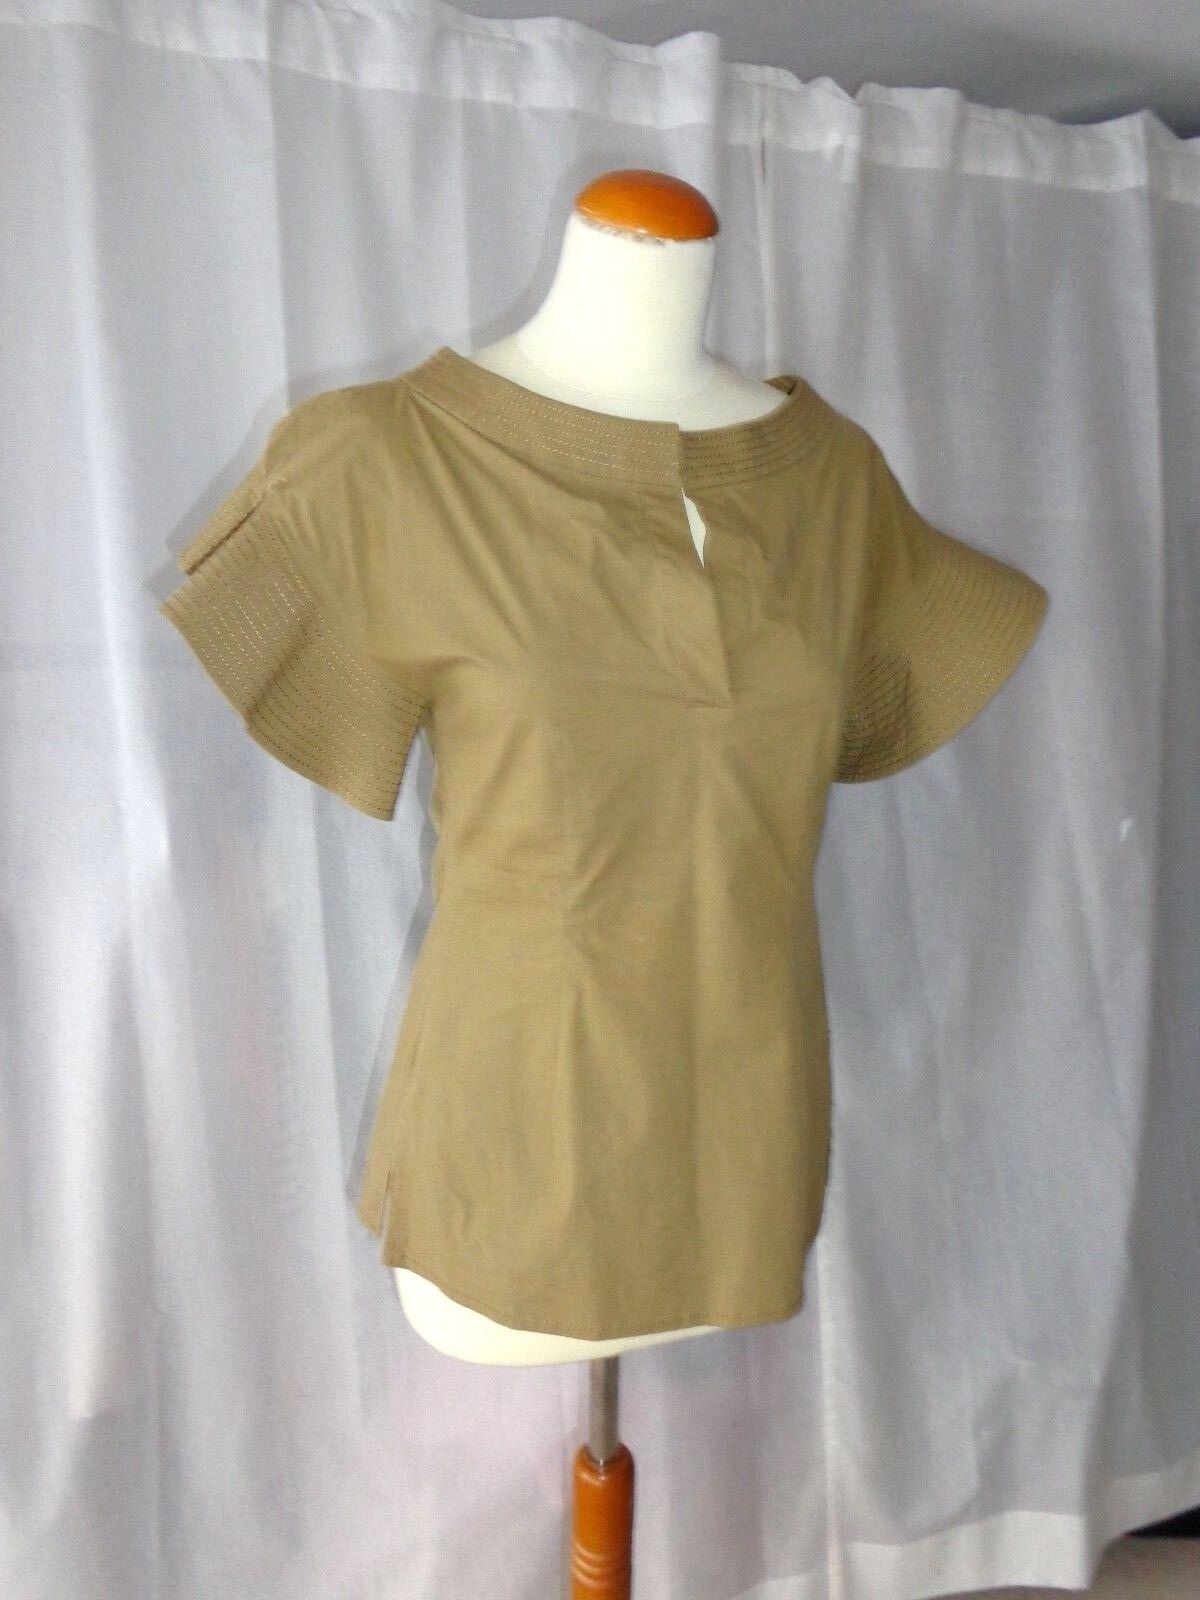 Comme neuf  CREAT chemisier SCHUMACHER T 2 36 camicetta Blouse shirt KAKI-DGoldthée